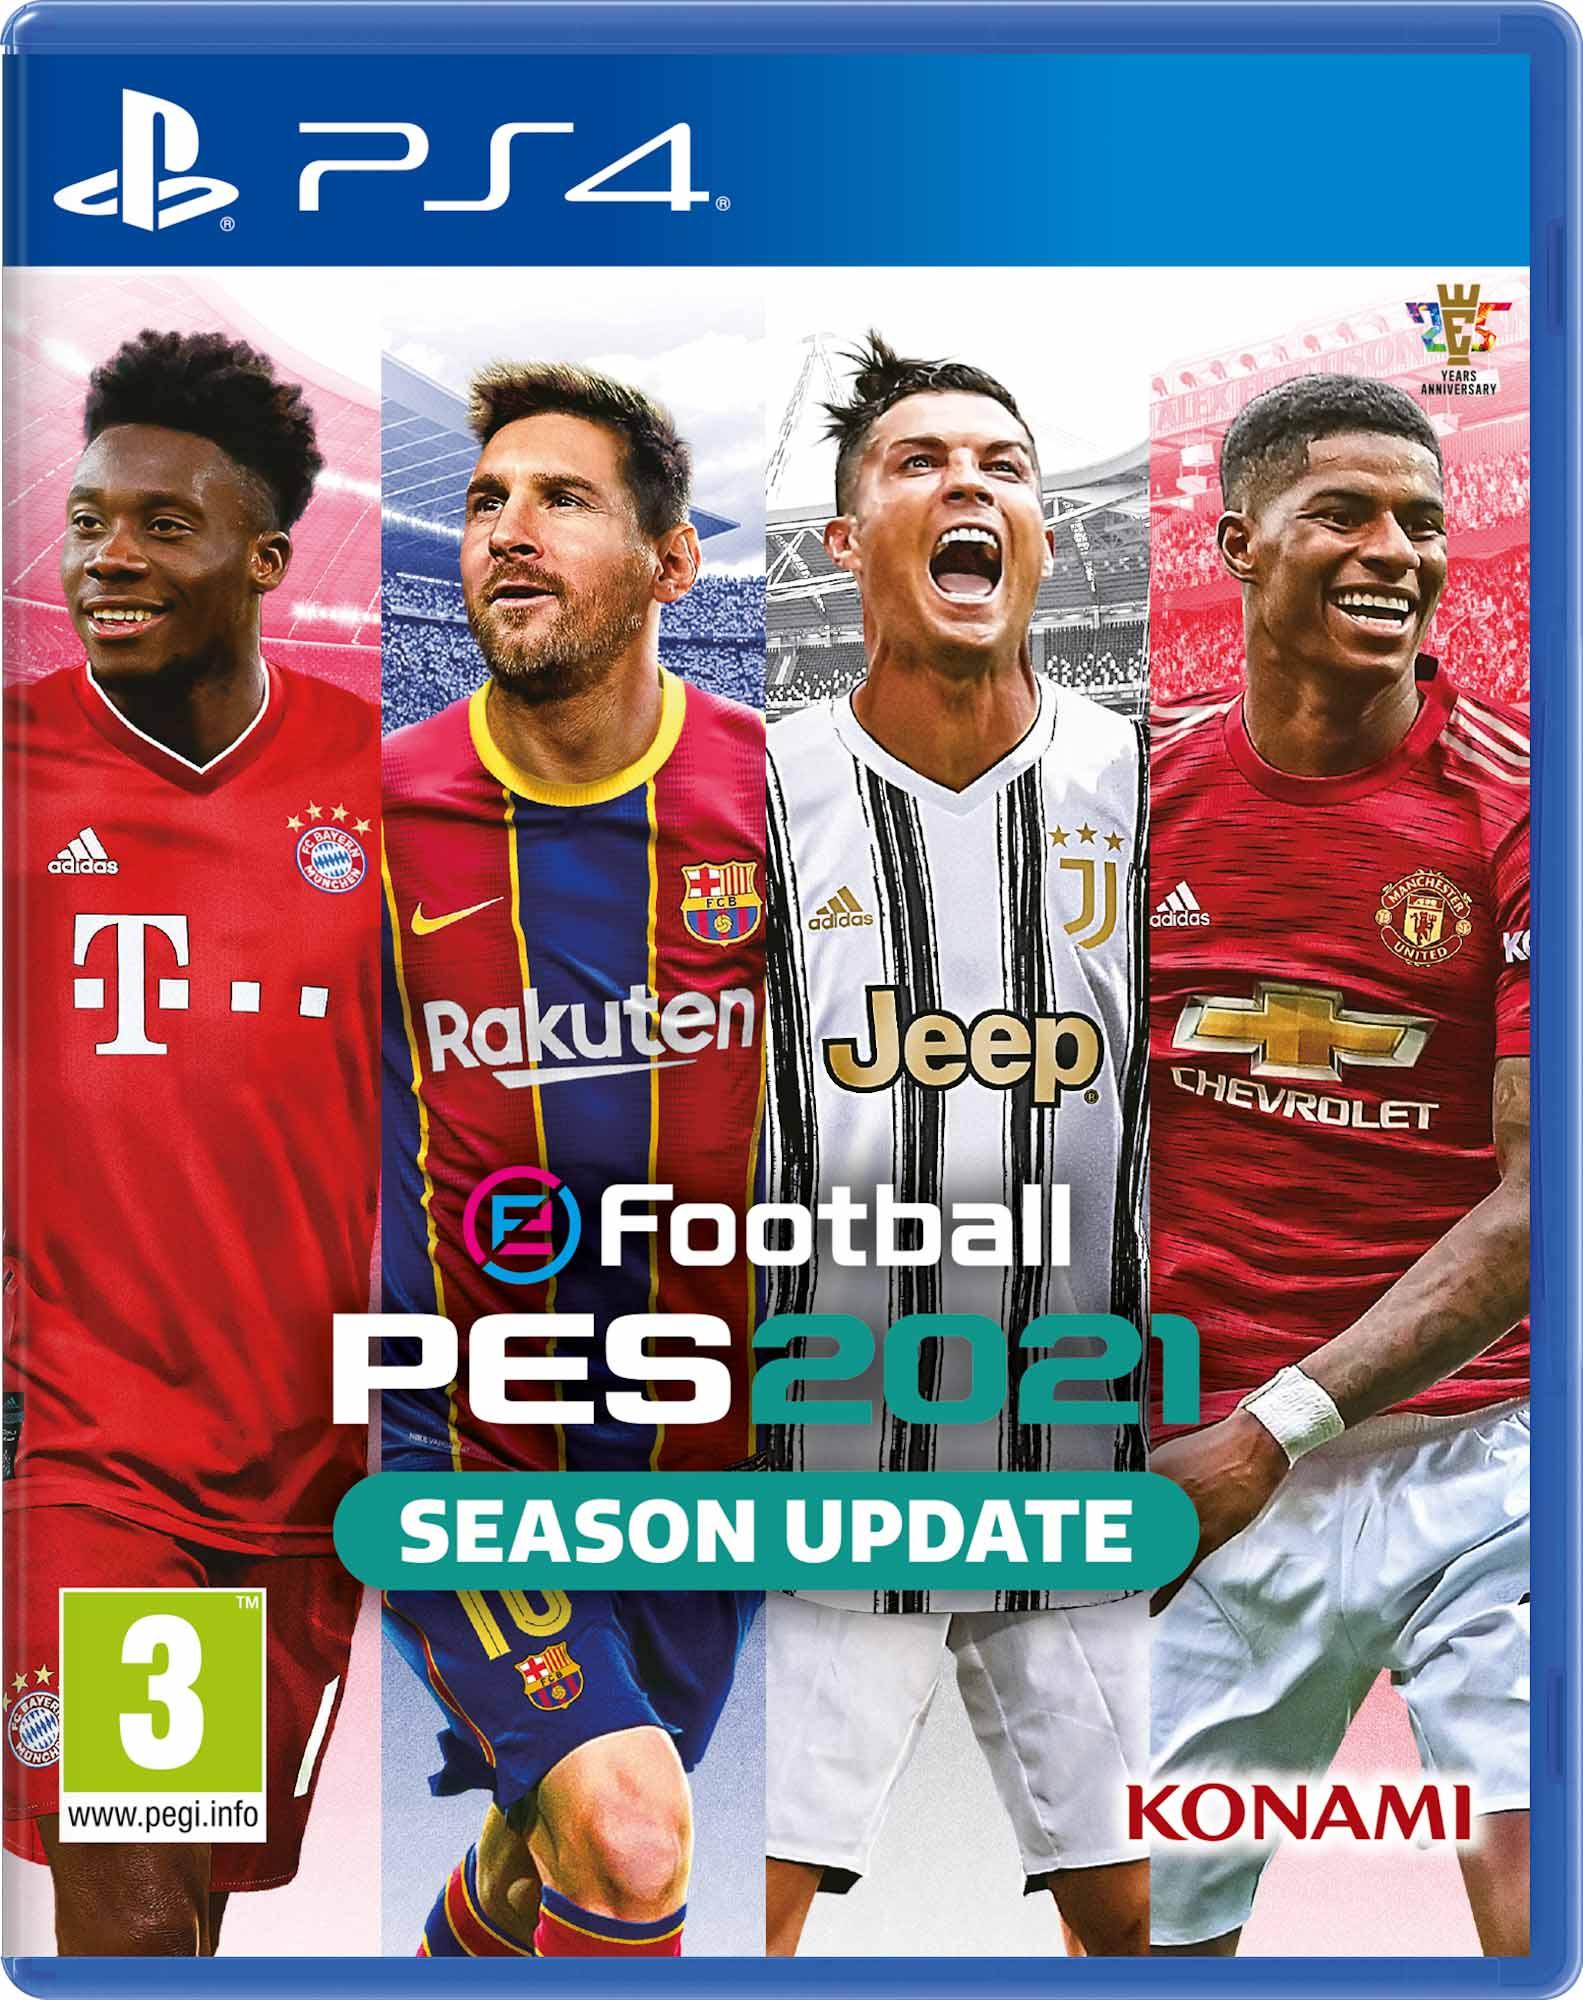 eFootball PES 2021 & myClub Bonus (Greek) PS4 - KONAMI 1.12.07.09.025